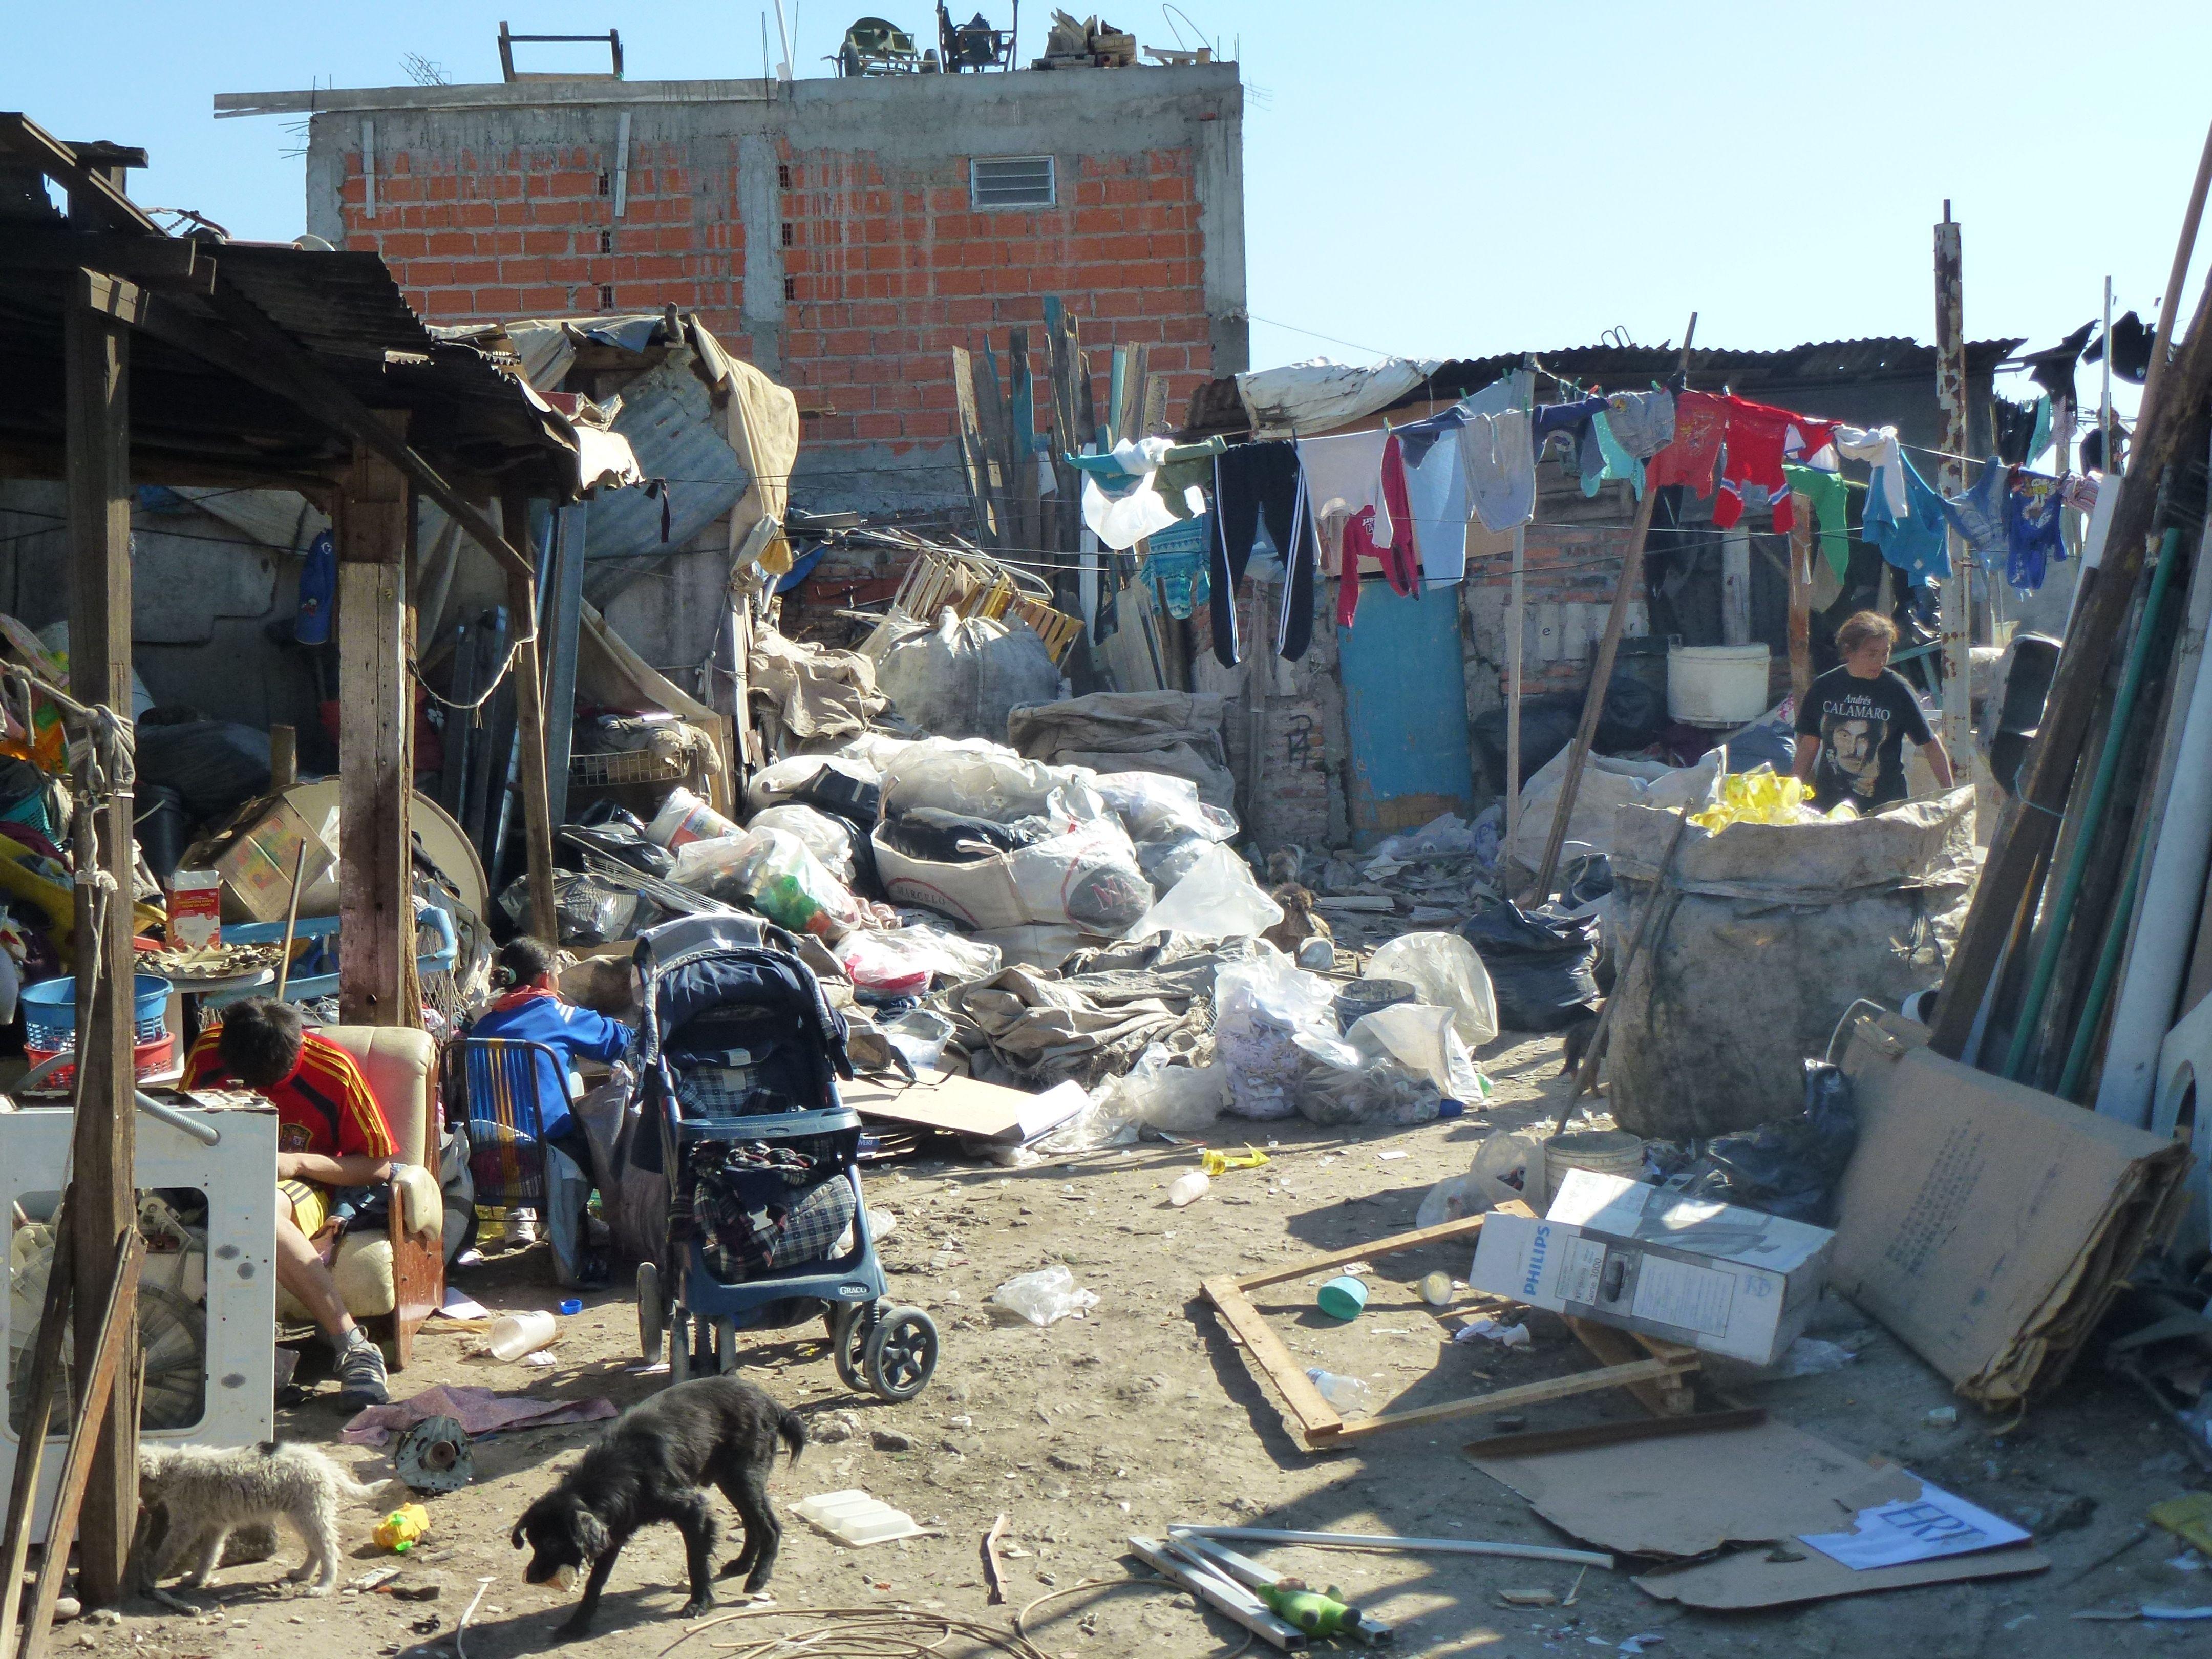 villa miseria ricardo blanco 39 s blog ForVillas Miserias En Argentina